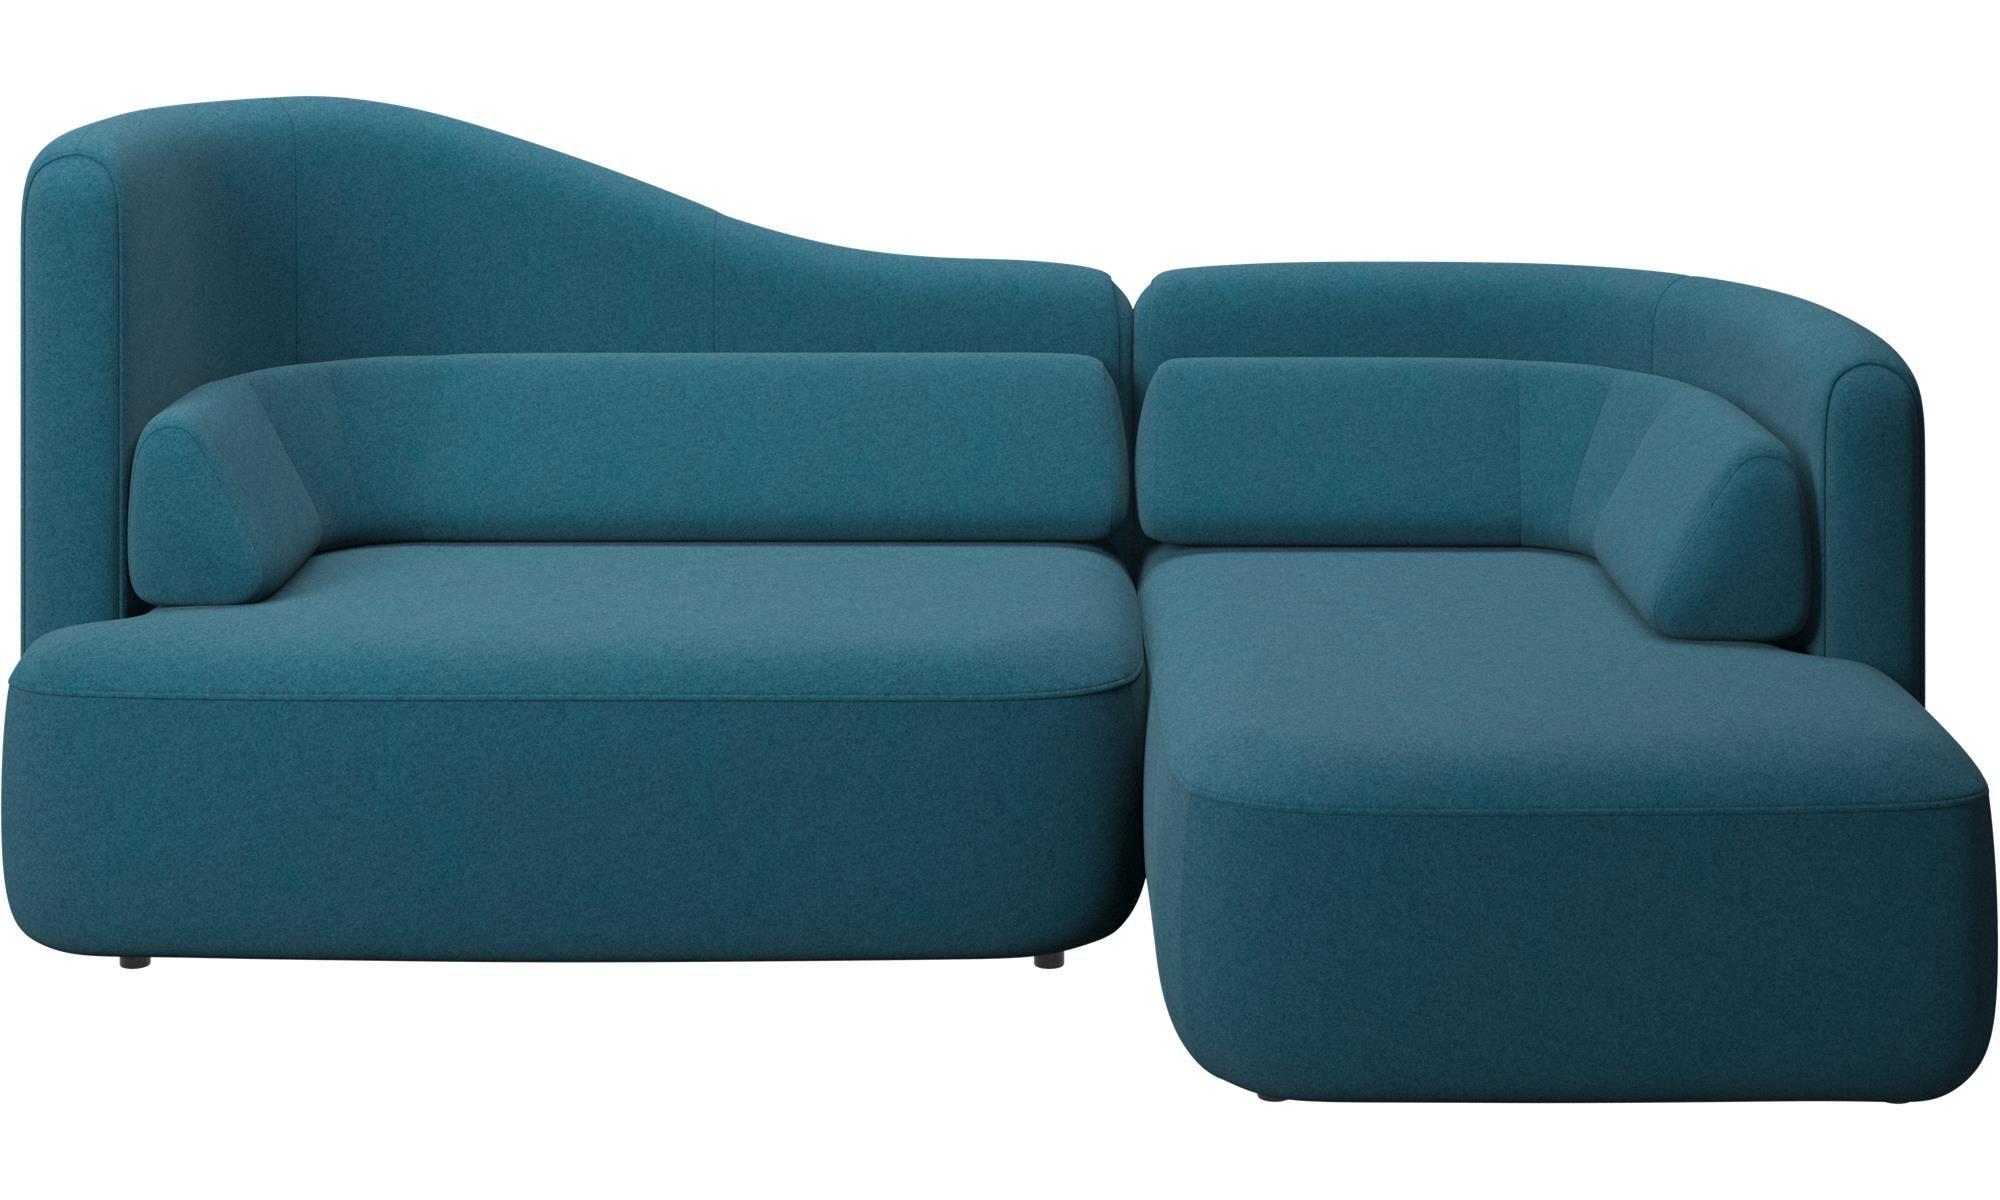 Office Sofas Ottawa Sofa Comfortable Chaise Sofa Blue Sofa